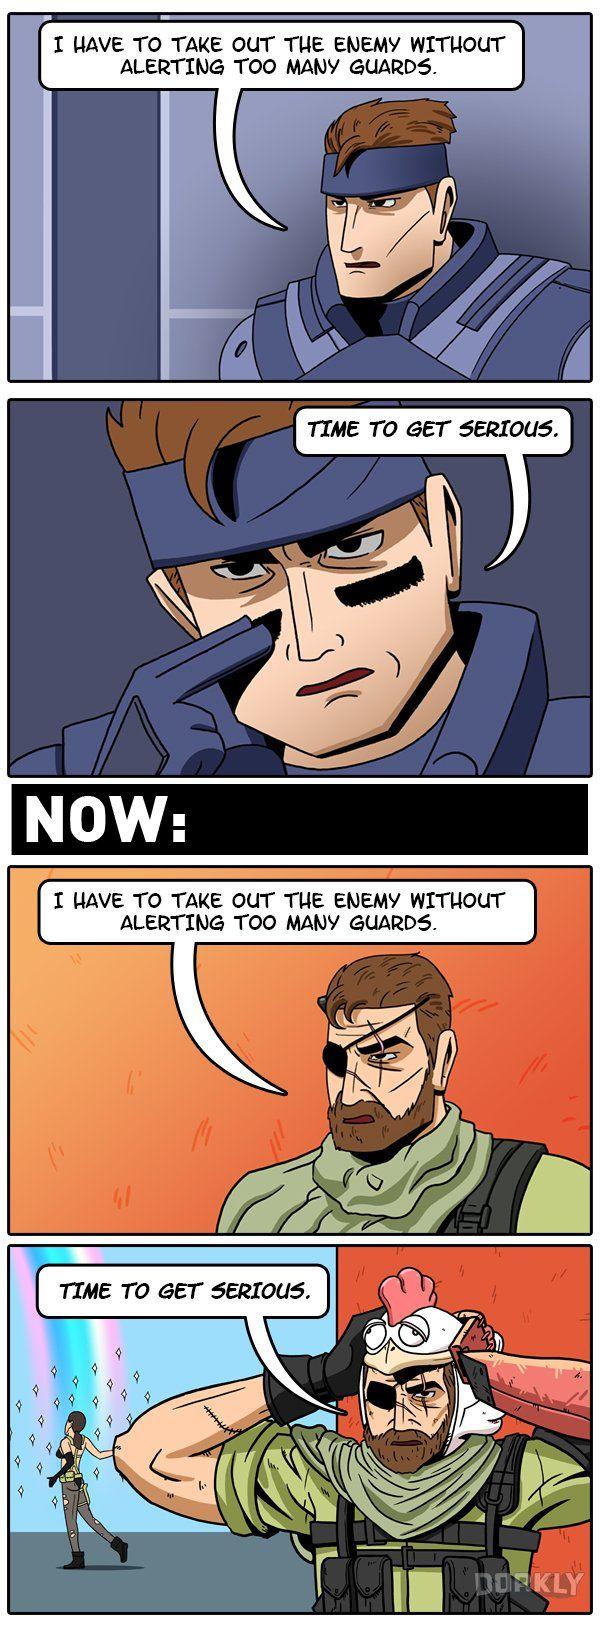 The Evolution of Metal Gear Solid Games #dorkly #comics #videogames